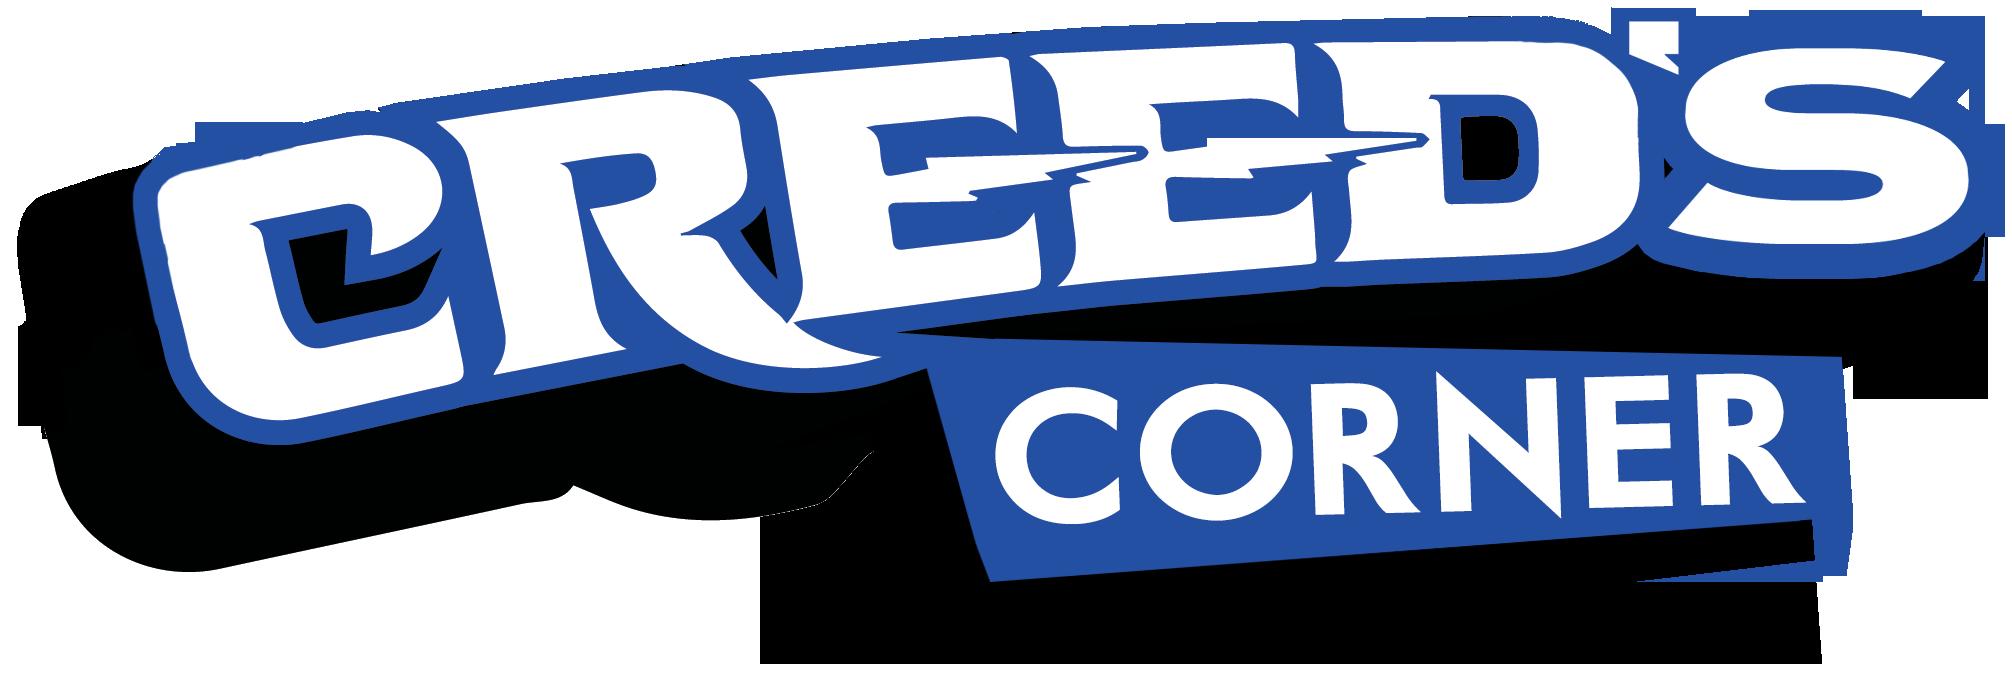 Creeds-Corner new jpg